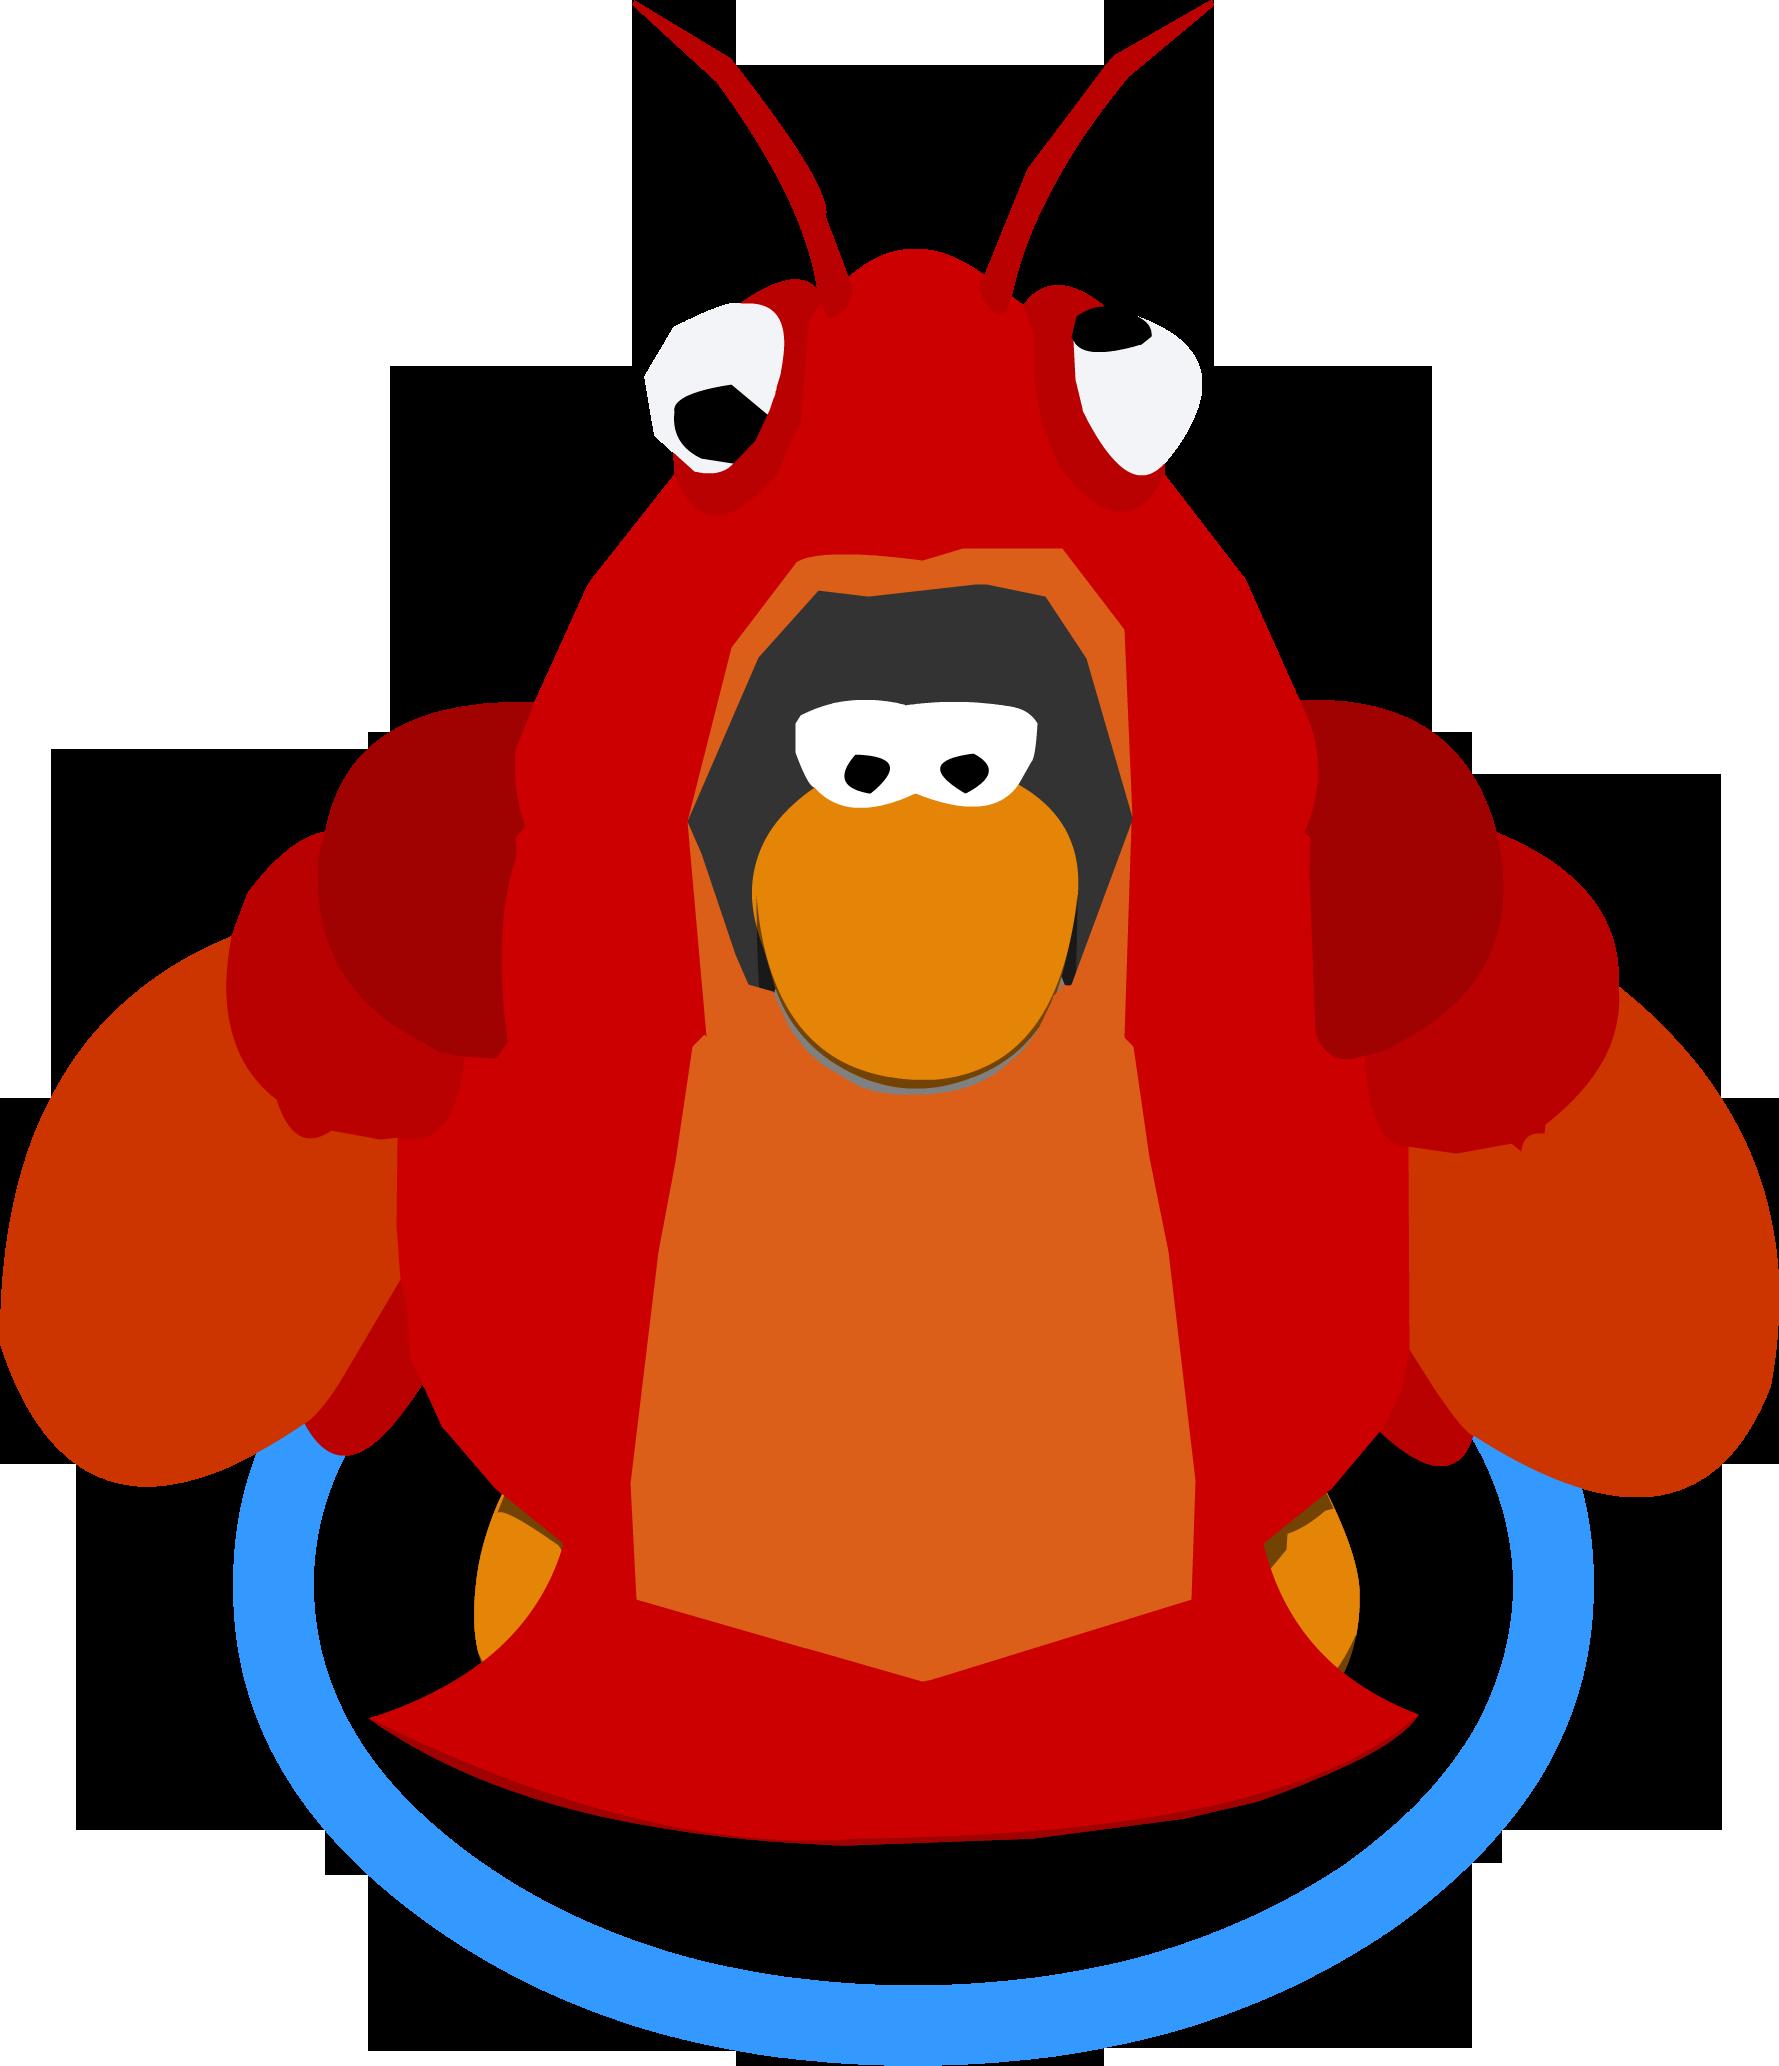 Lobster clipart langosta. Image costume cu ig